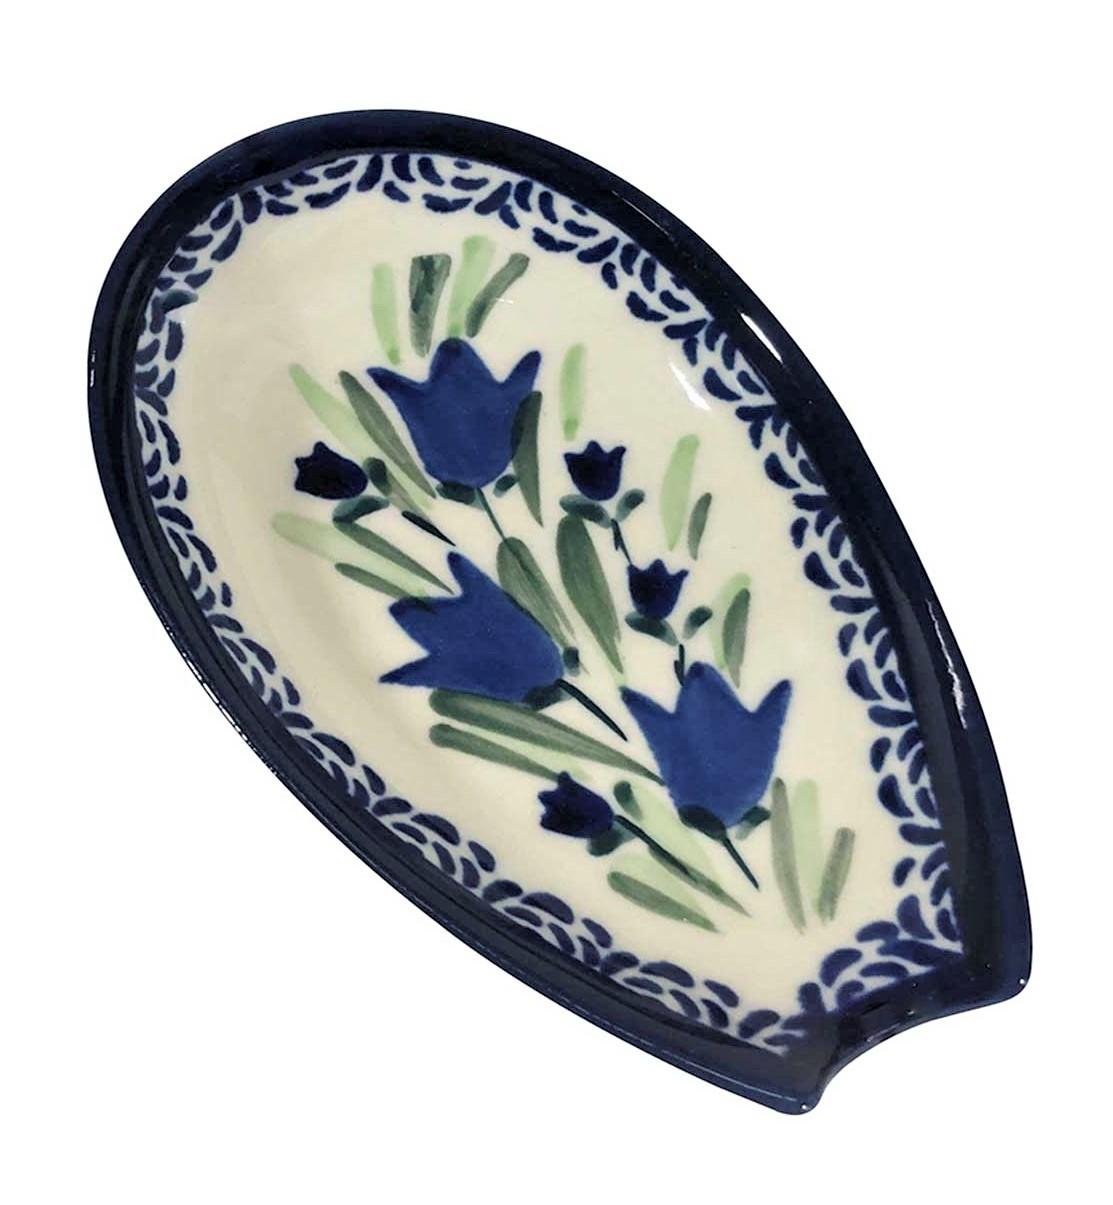 "Pottery Avenue Blue Tulip 5"" Stoneware Spoon Rest - 1015-160AR"